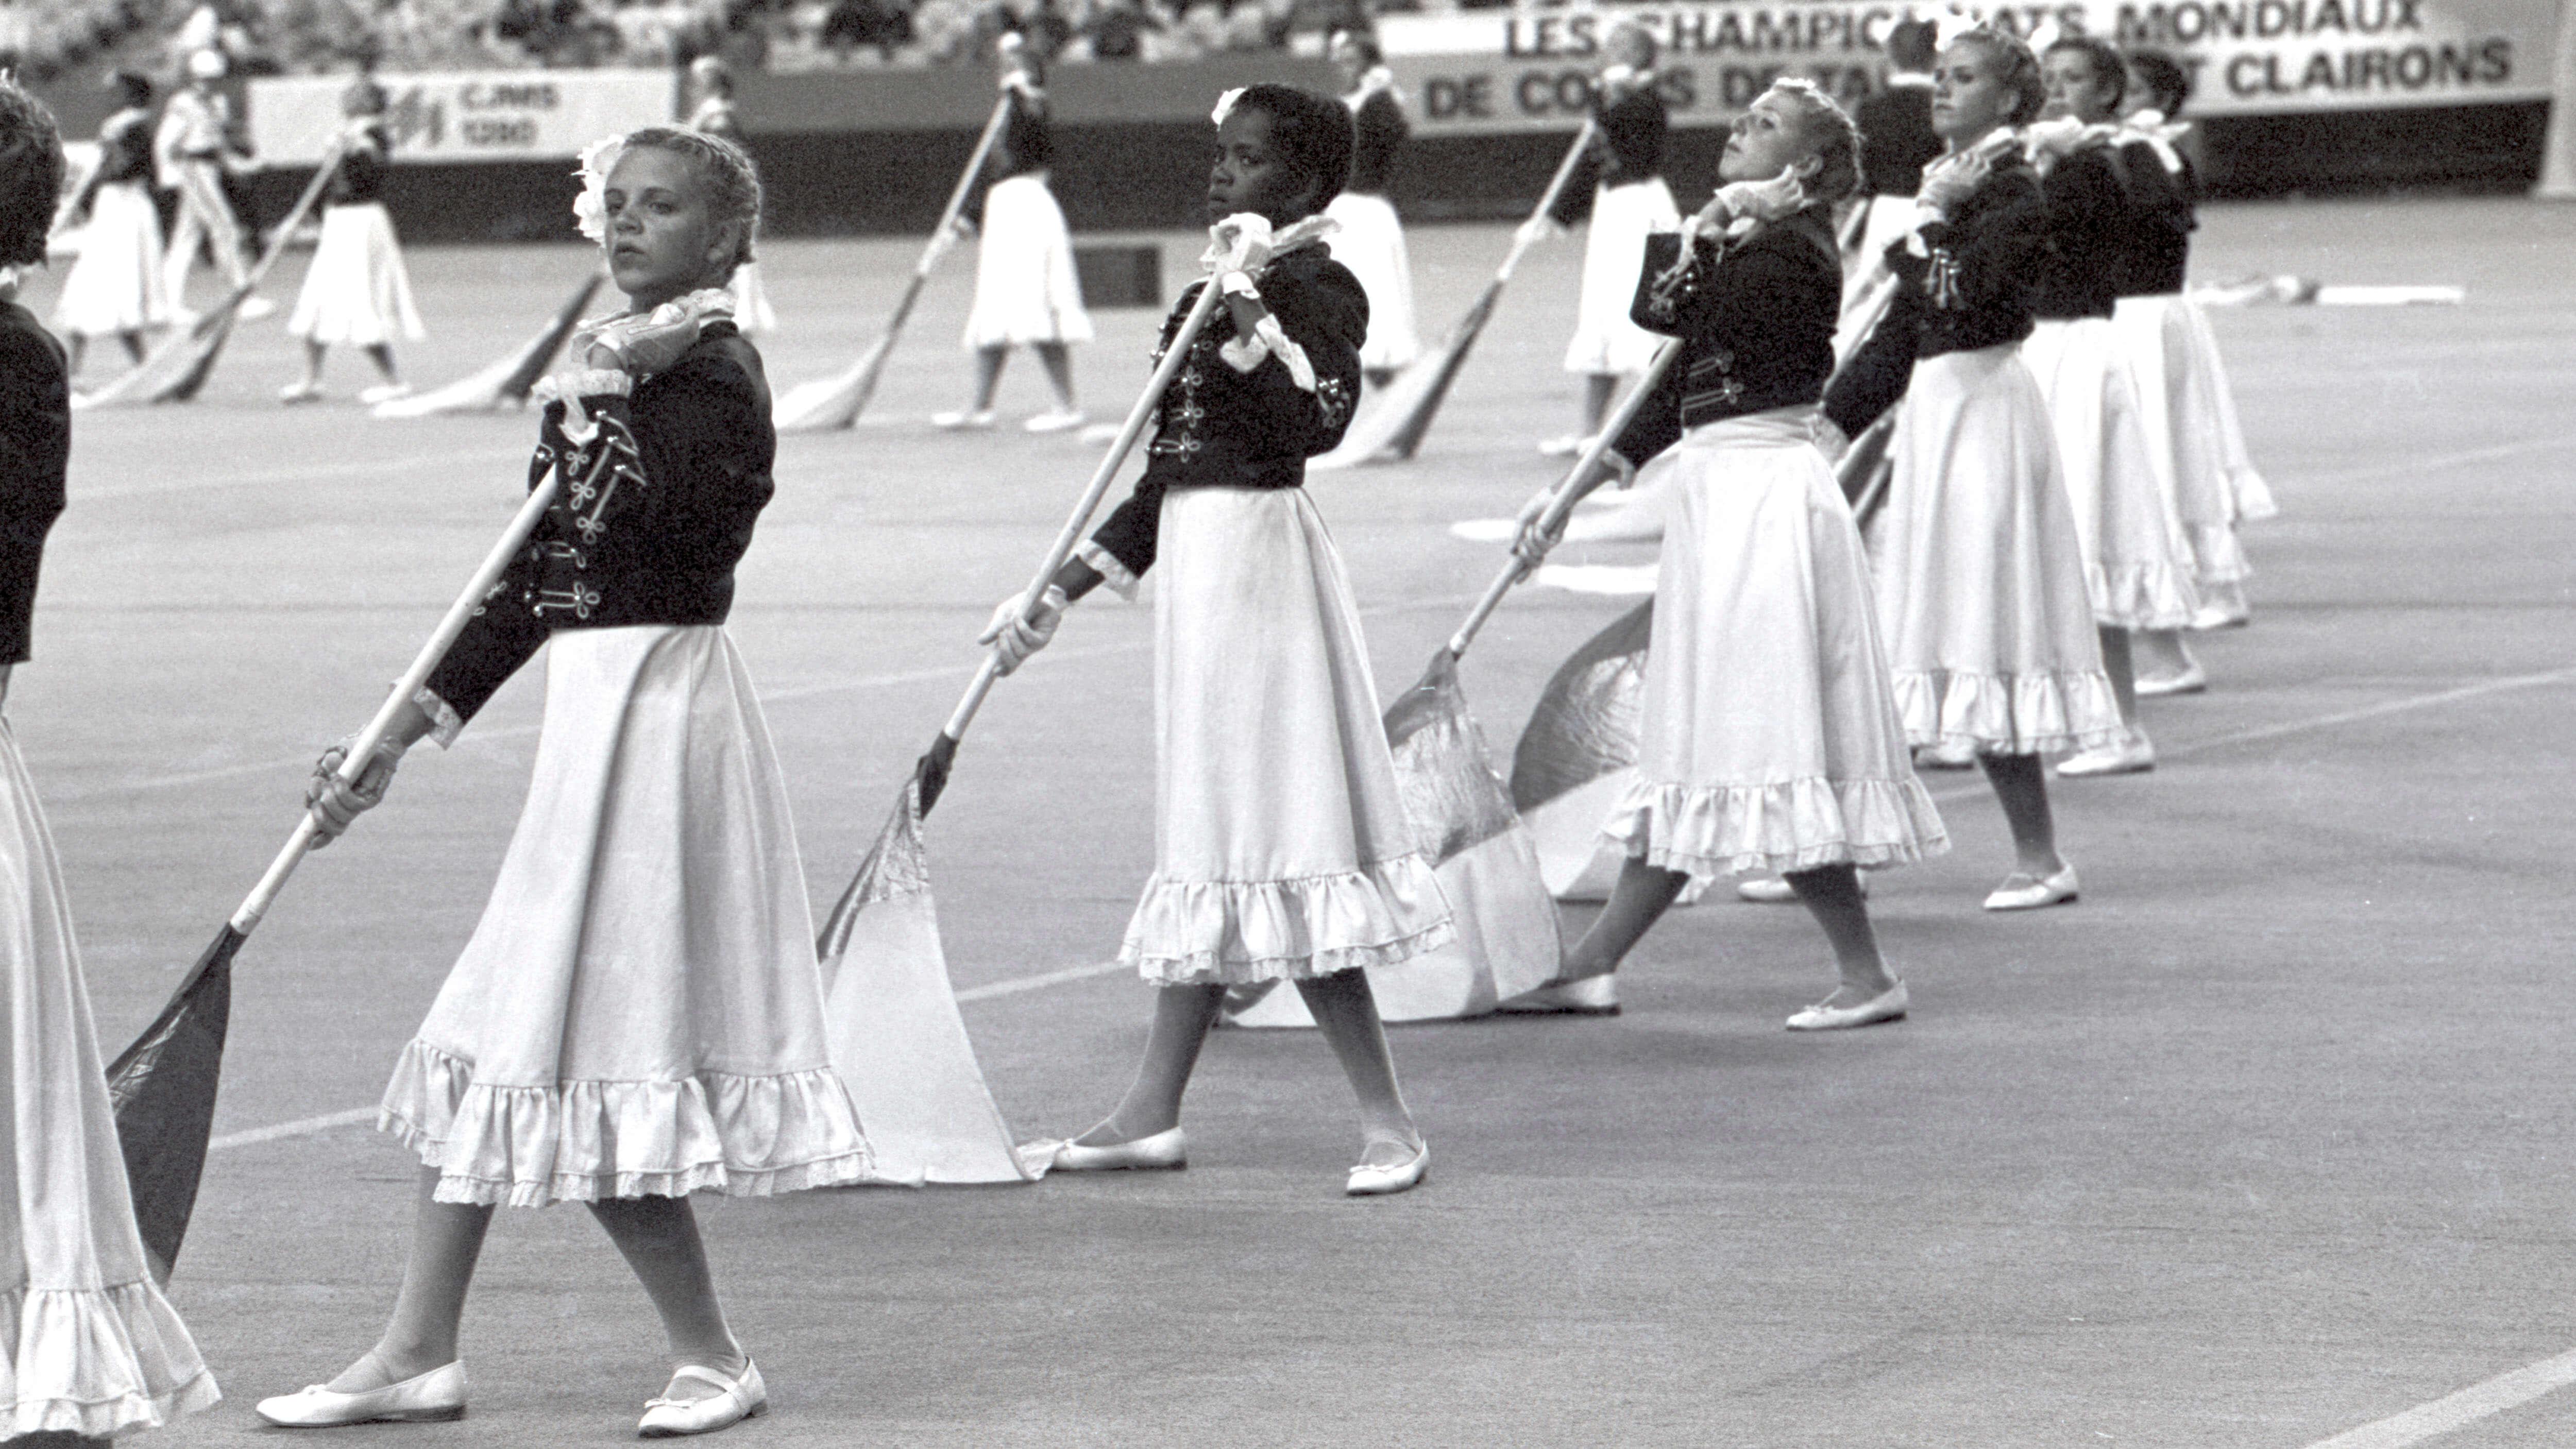 1982 Garfield Cadets